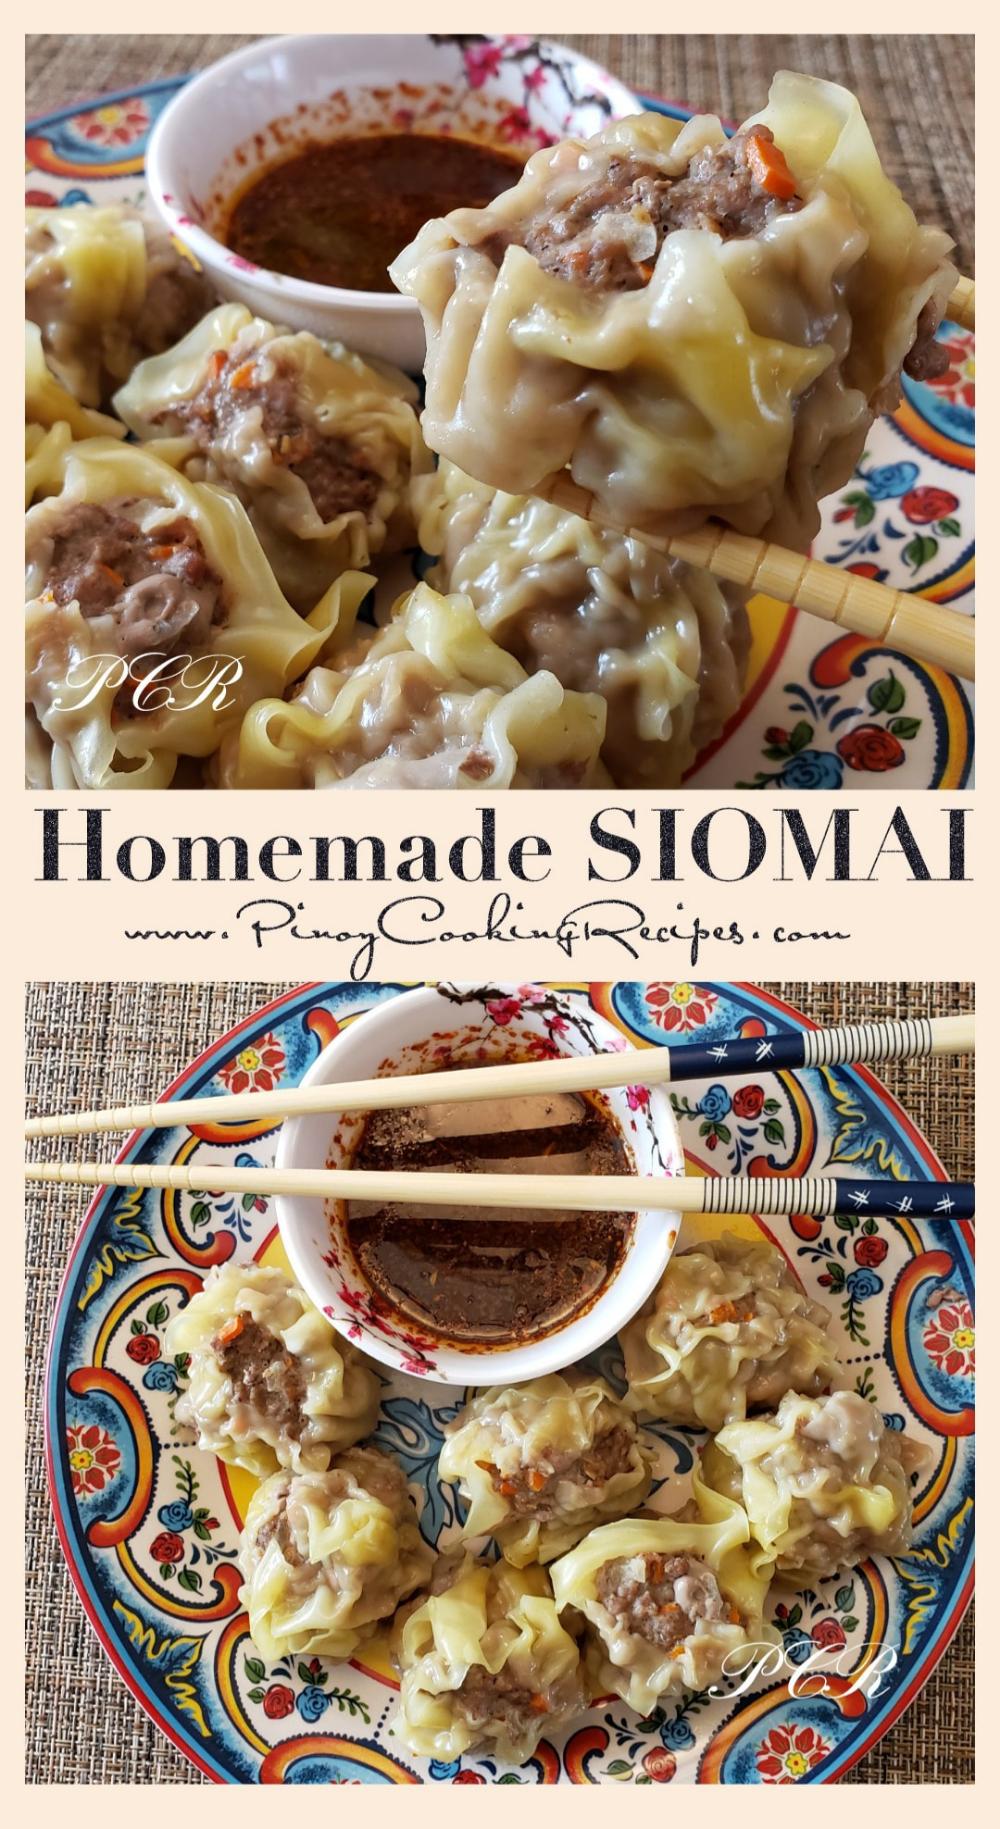 beef siomai - PinoyCookingRecipes   Siomai, Cooking ...